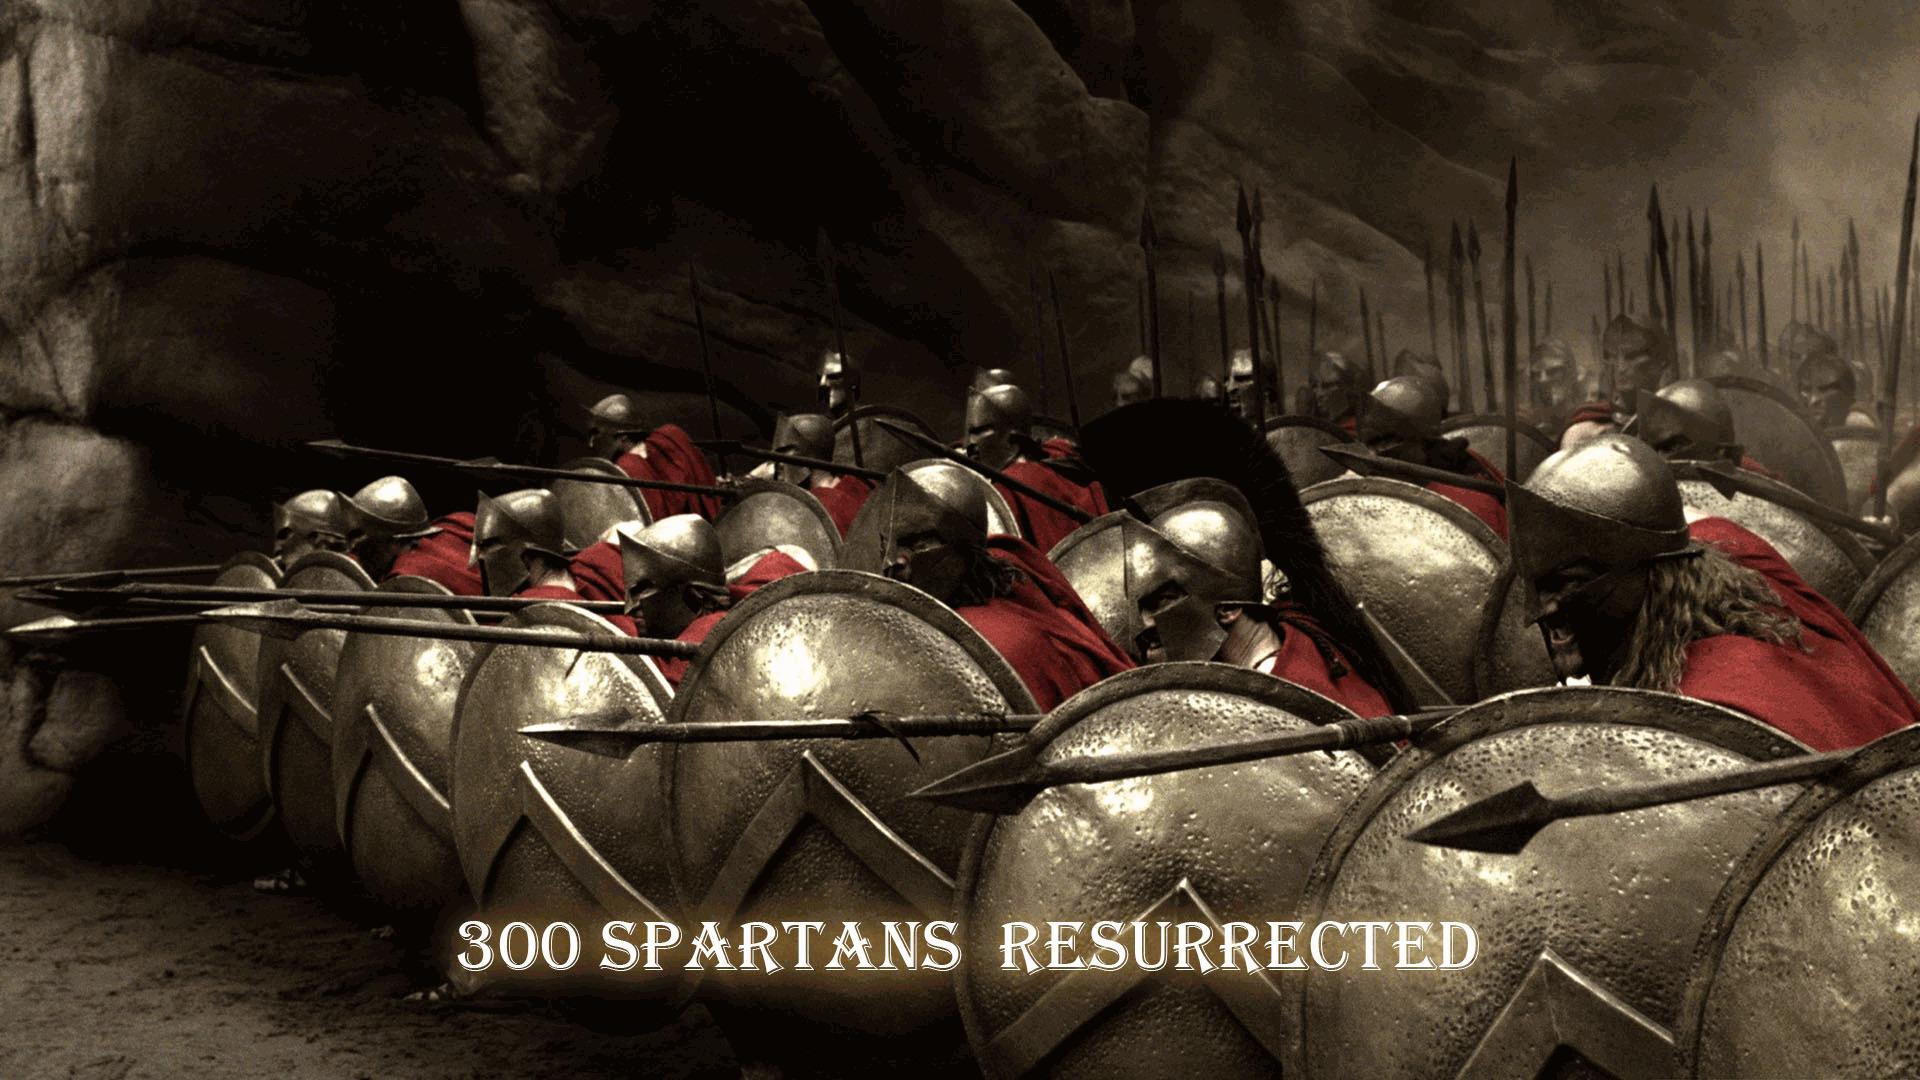 300 Spartans R (1.9HF89) - Warcraft 3: Custom Map avatar